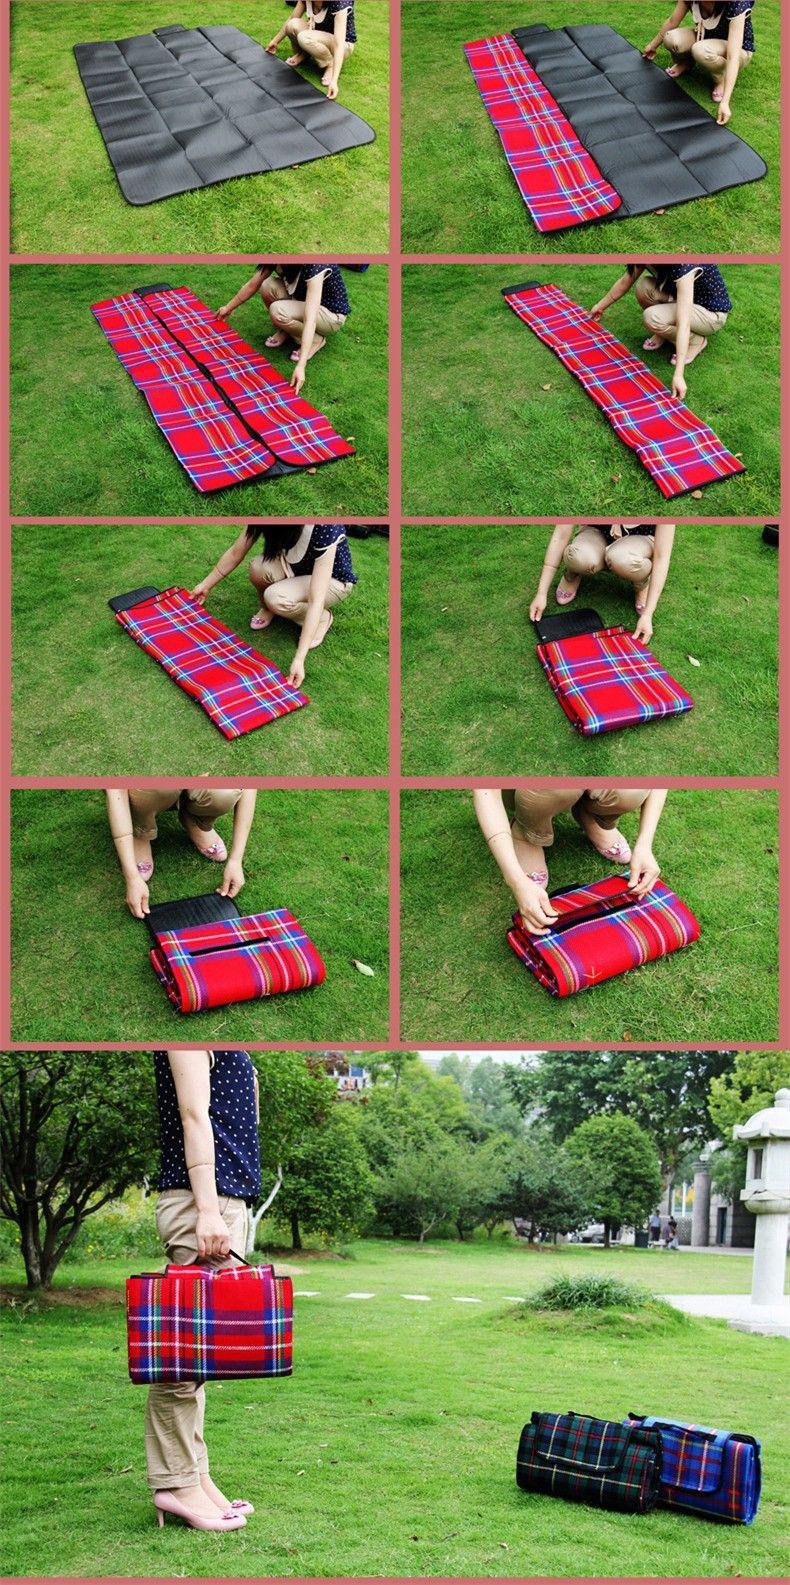 5 Size Outdoor Beach Picnic Folding Camping Mat Waterproof ...